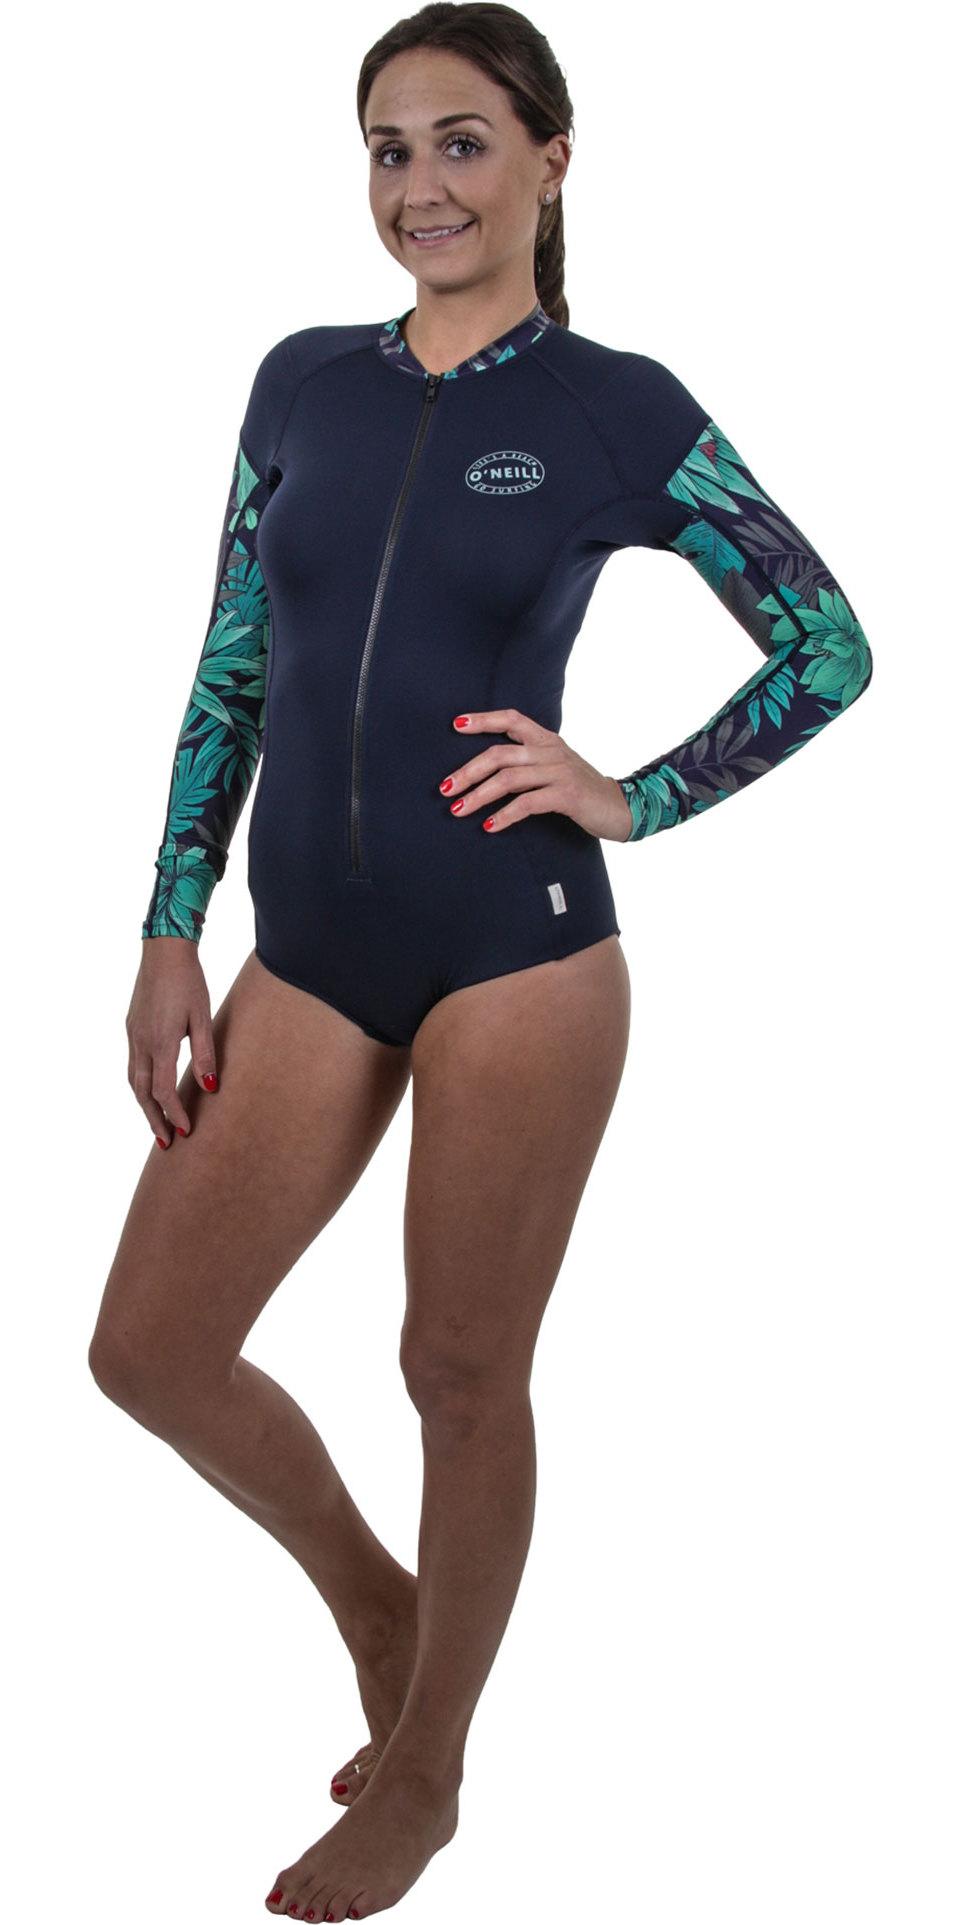 5d41990768760 2019 O Neill - Traje de surf de manga larga para mujer con cremallera  completa ...